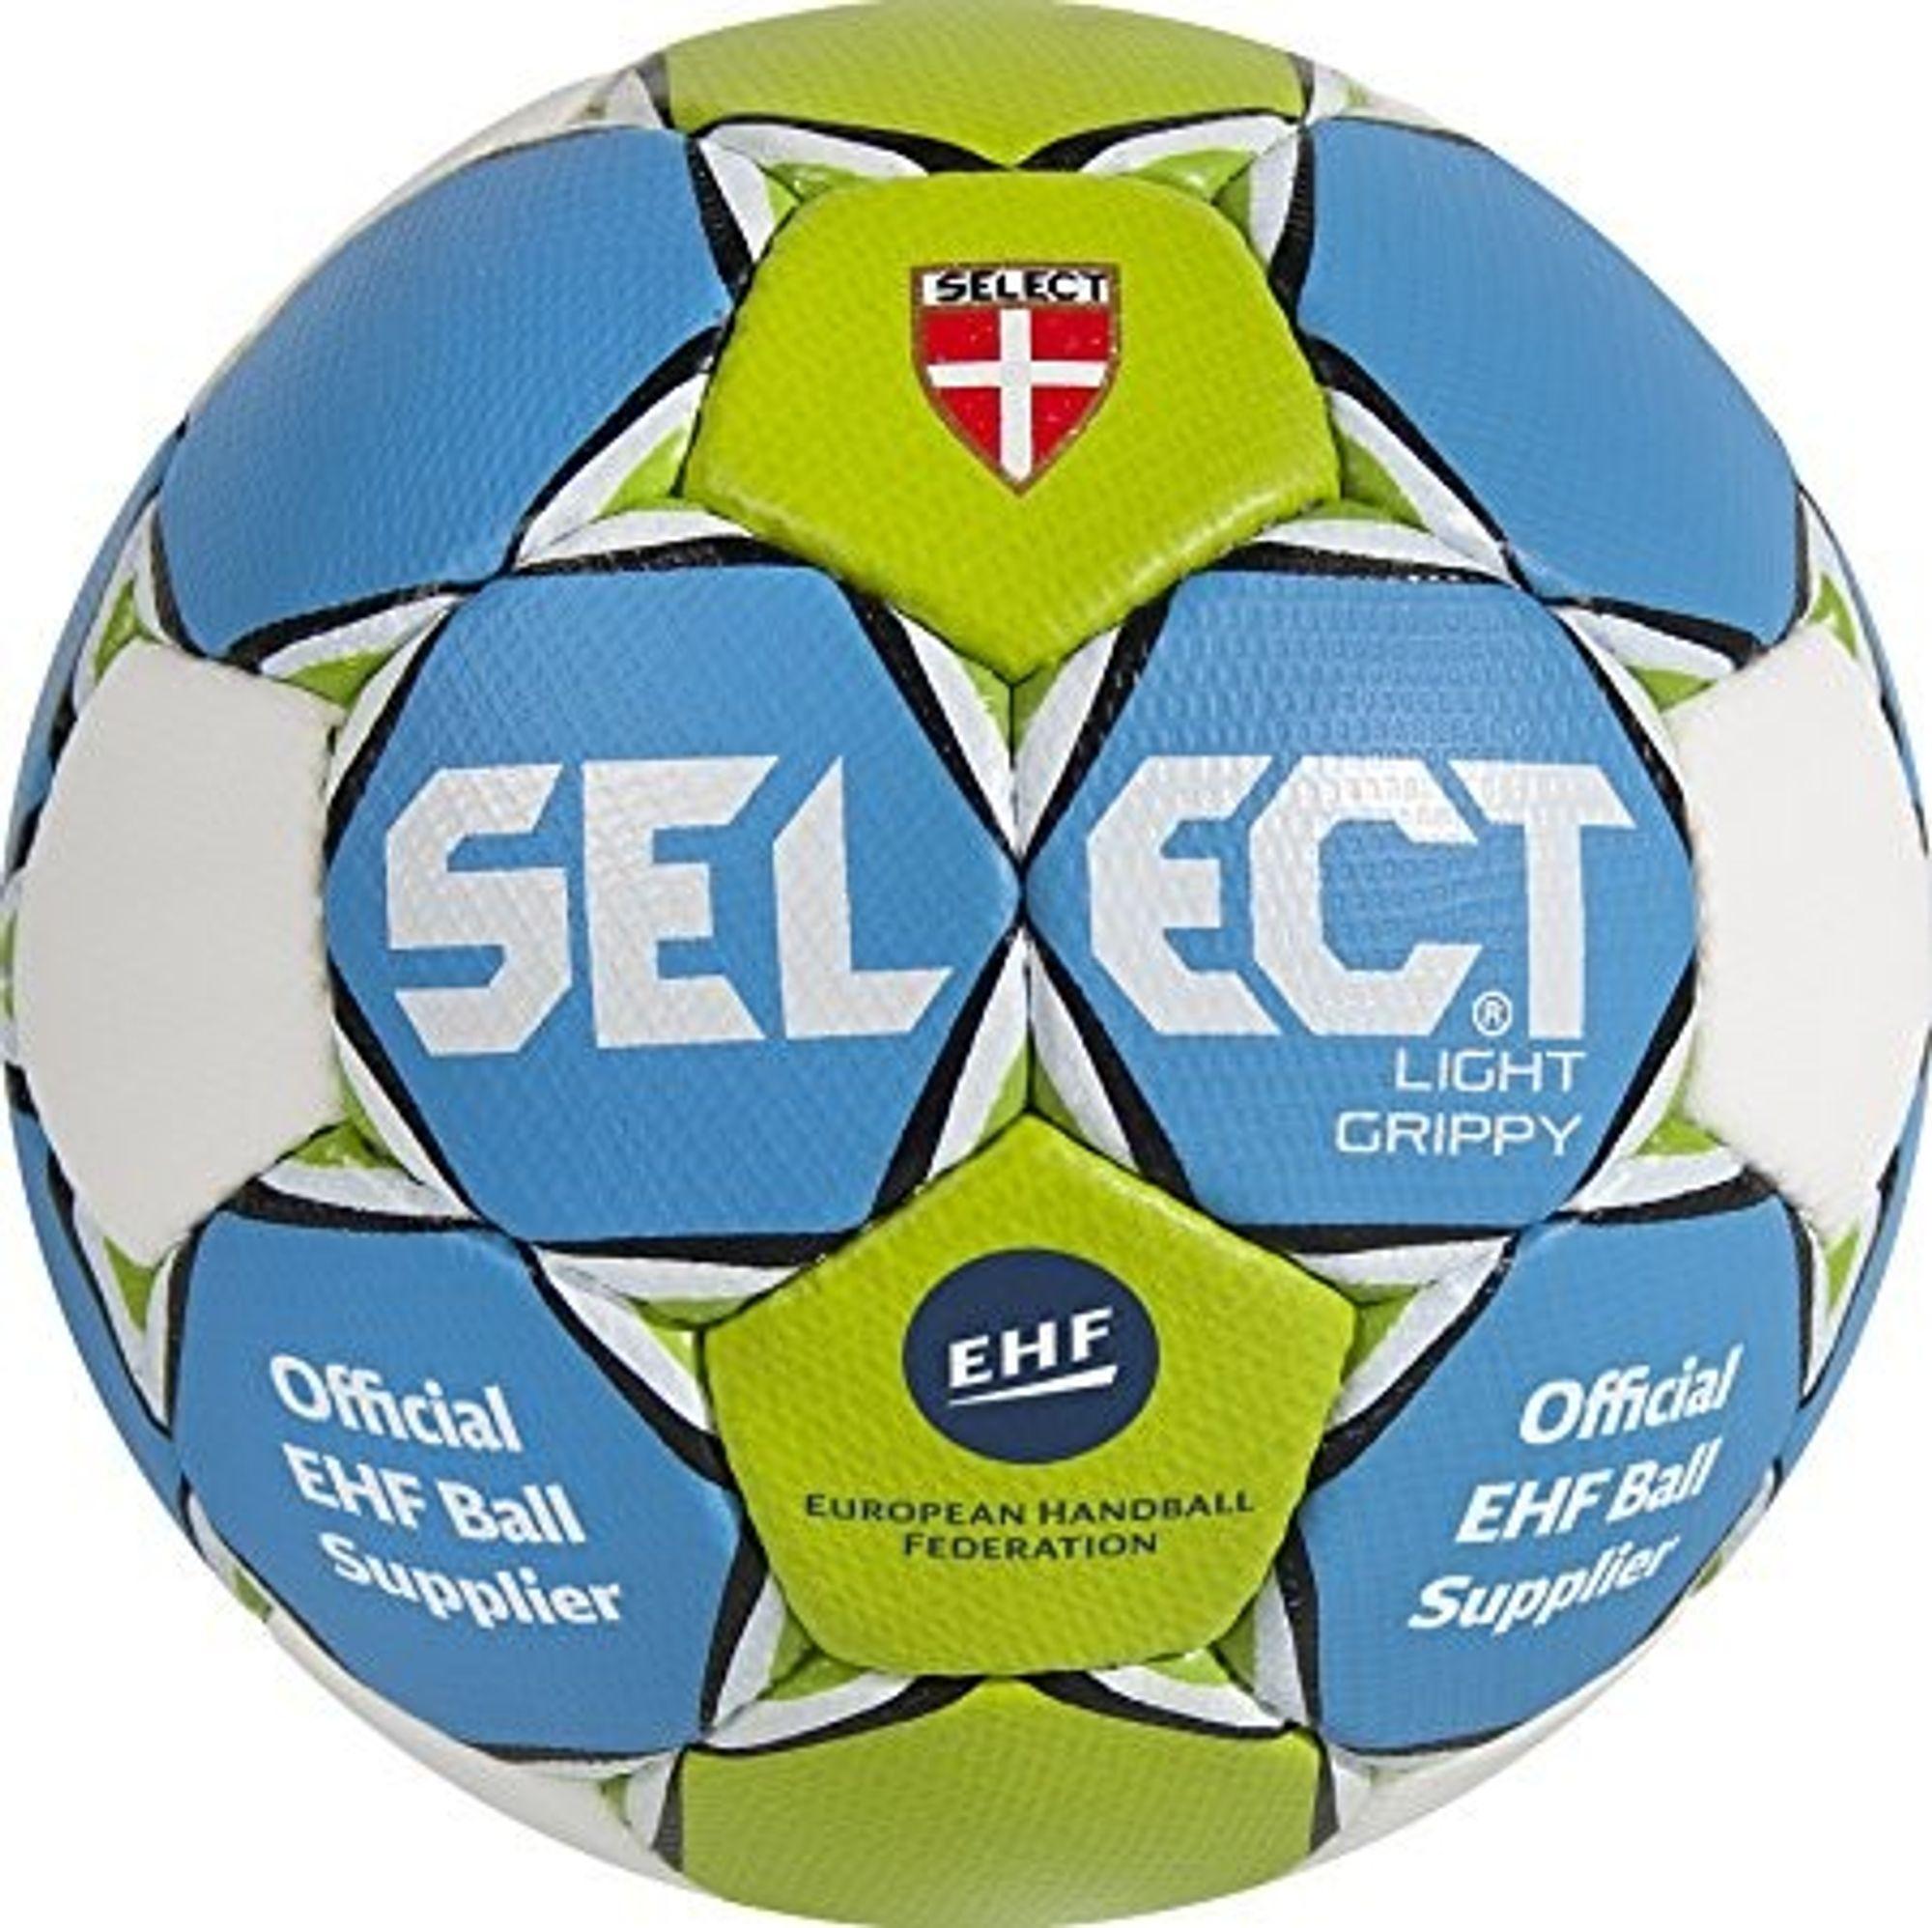 Select Sport Light Grippy - blau/grün/weiß